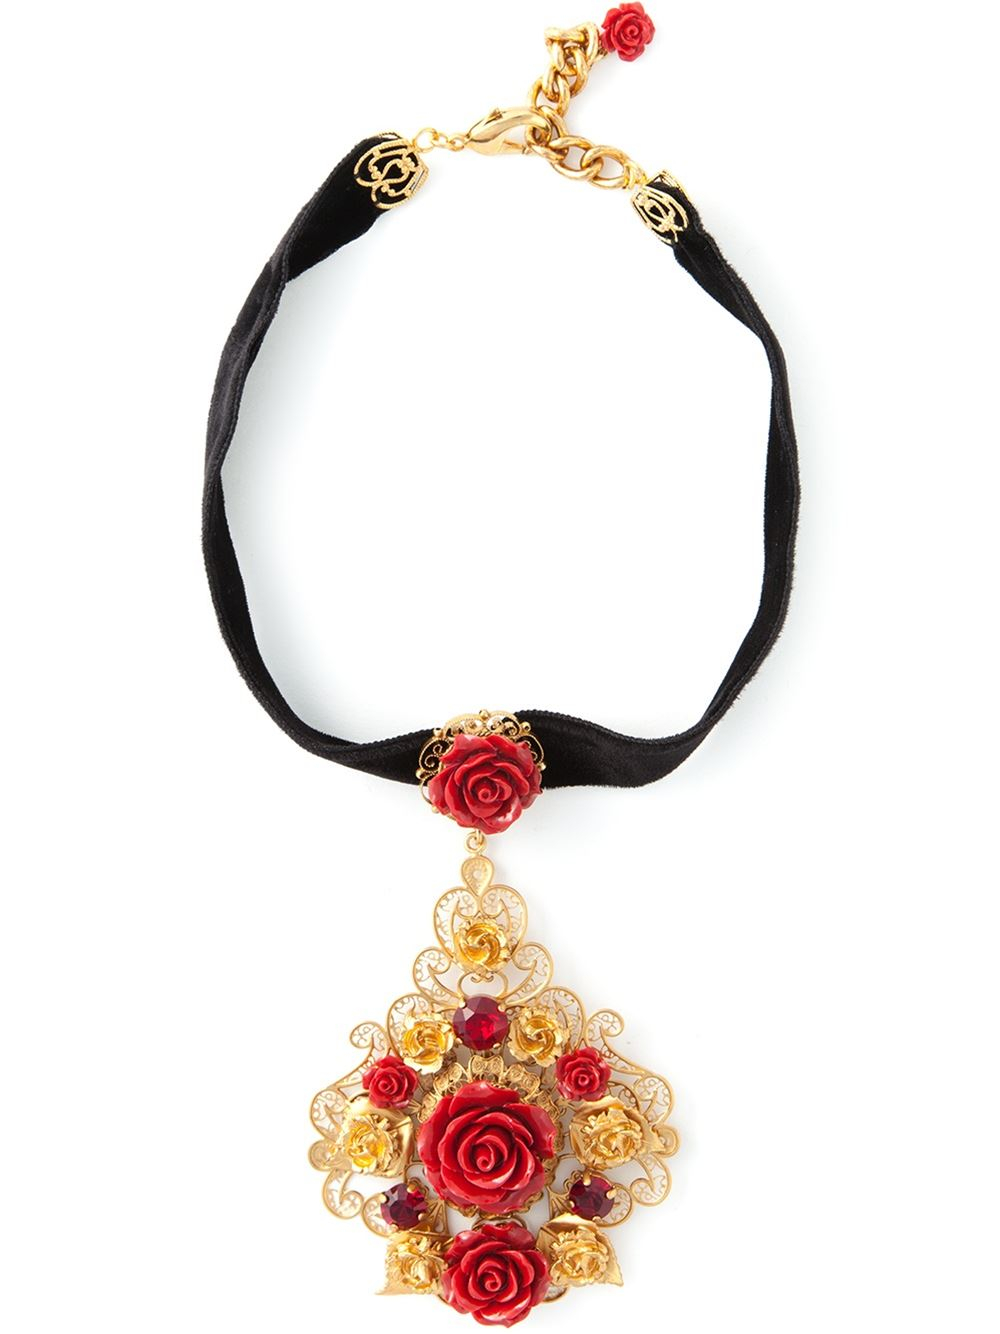 Cristal Rose Collier - Métallique Dolce & Gabbana SZeQMc